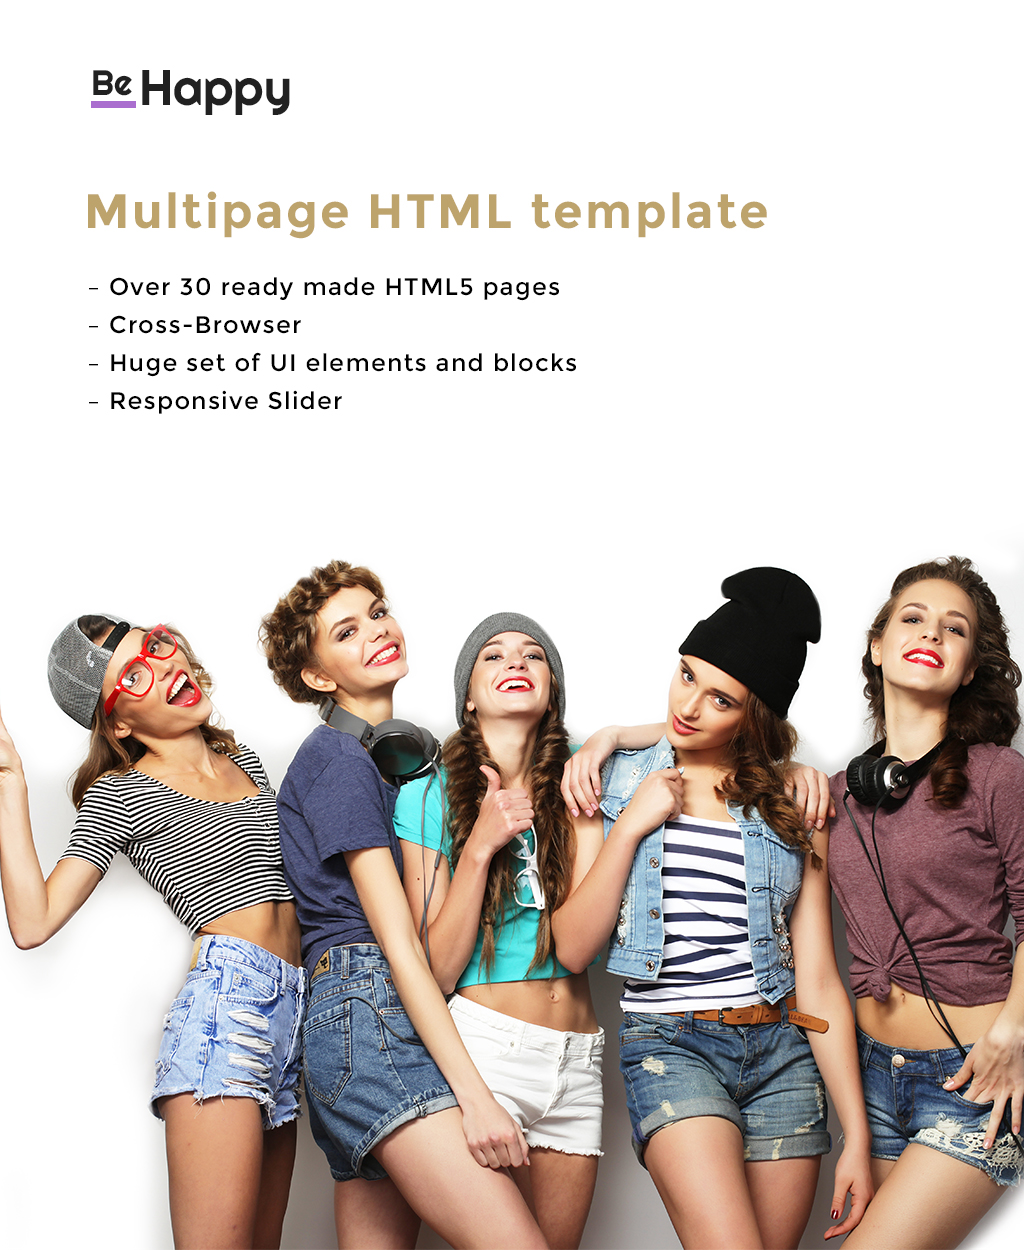 """Be Happy - Health Magazine Multipage"" modèle web adaptatif #64625"